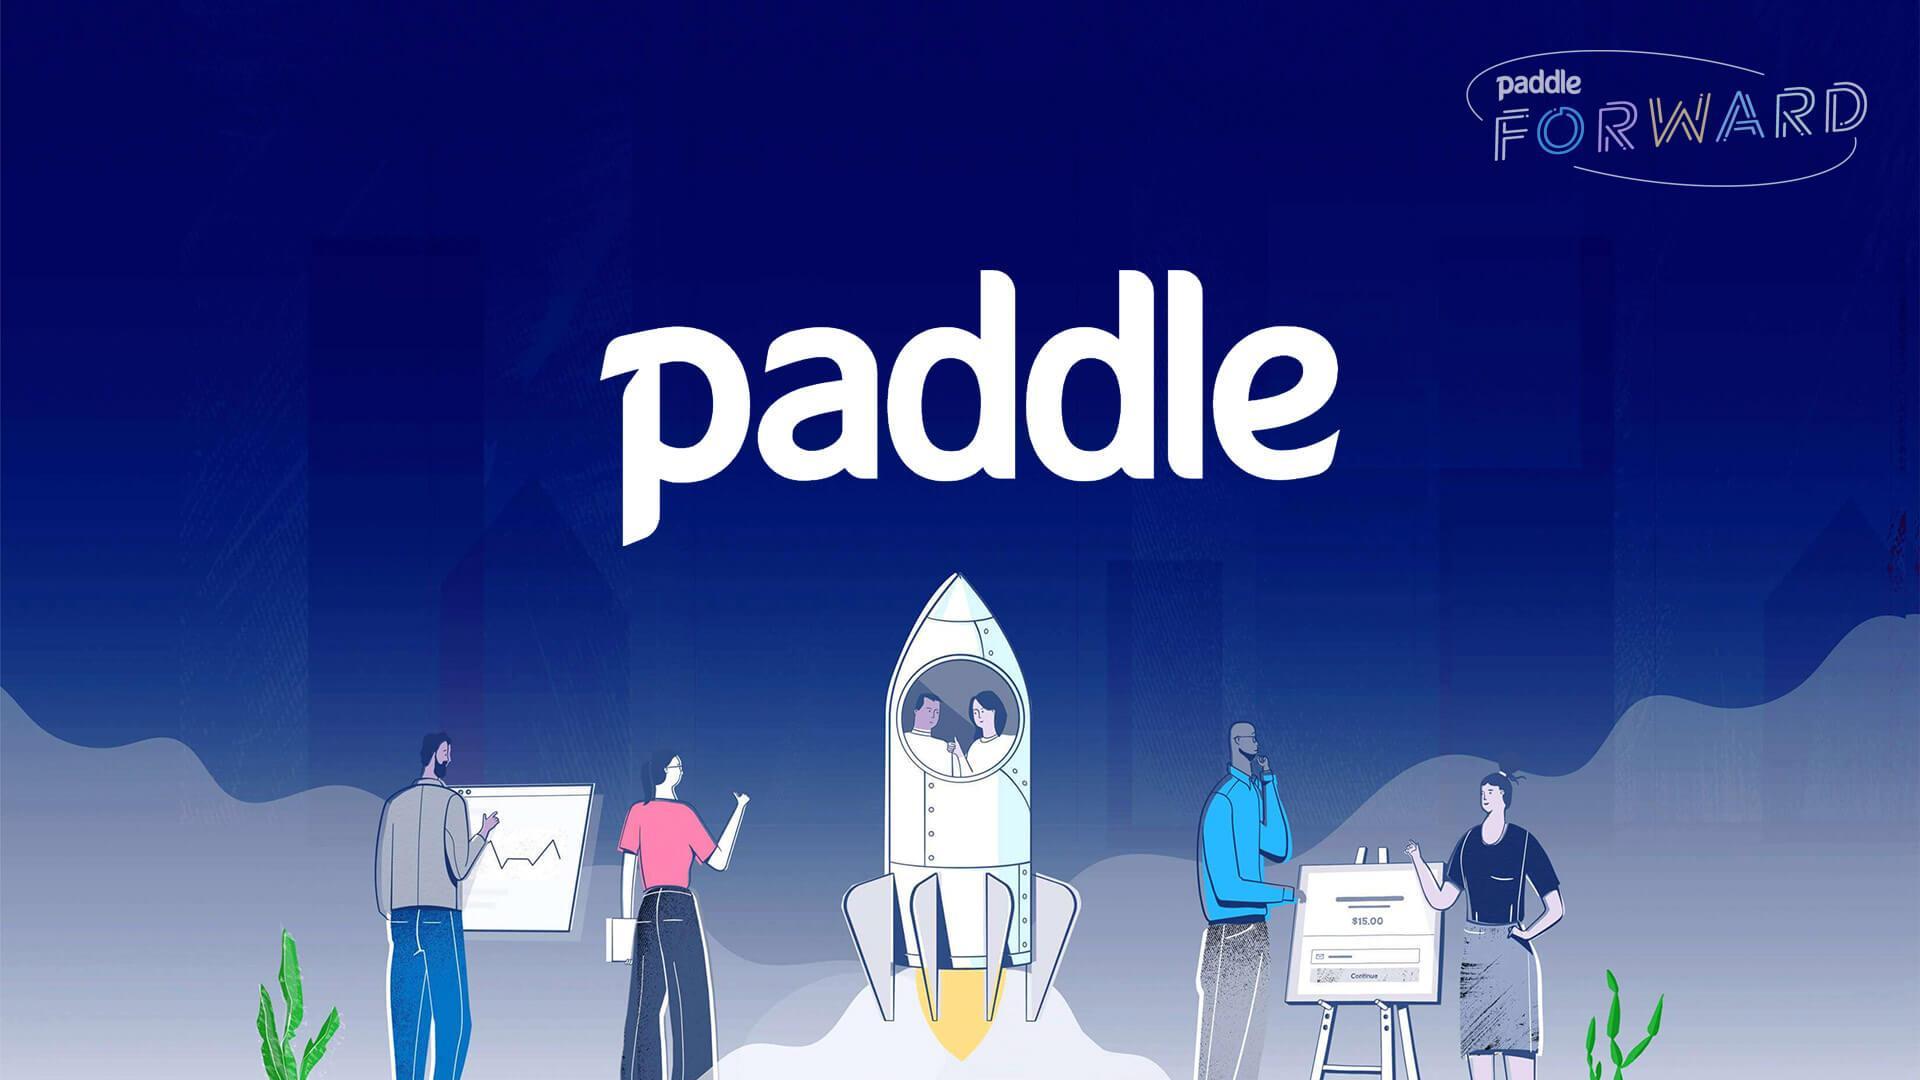 Paddle Payment Platform